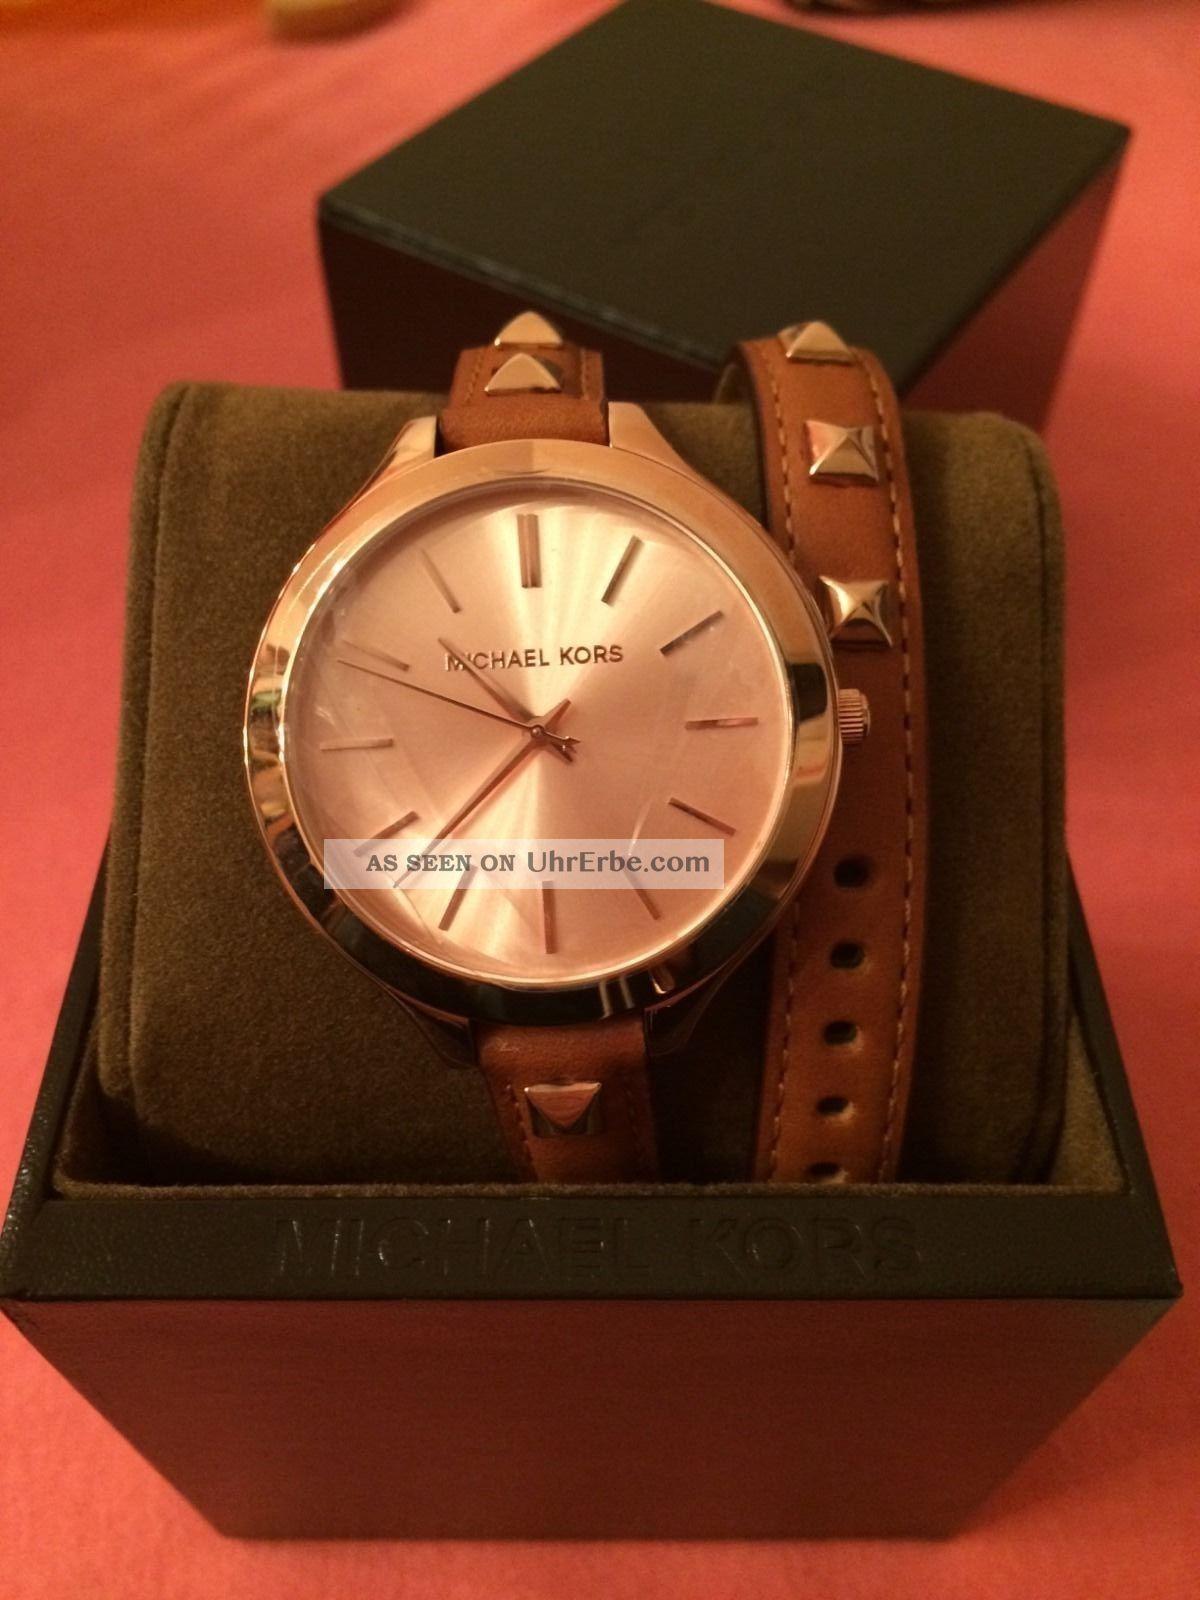 Michael Kors Uhr Mk2299 Brau Mit Nieten Rosegold Geschenk